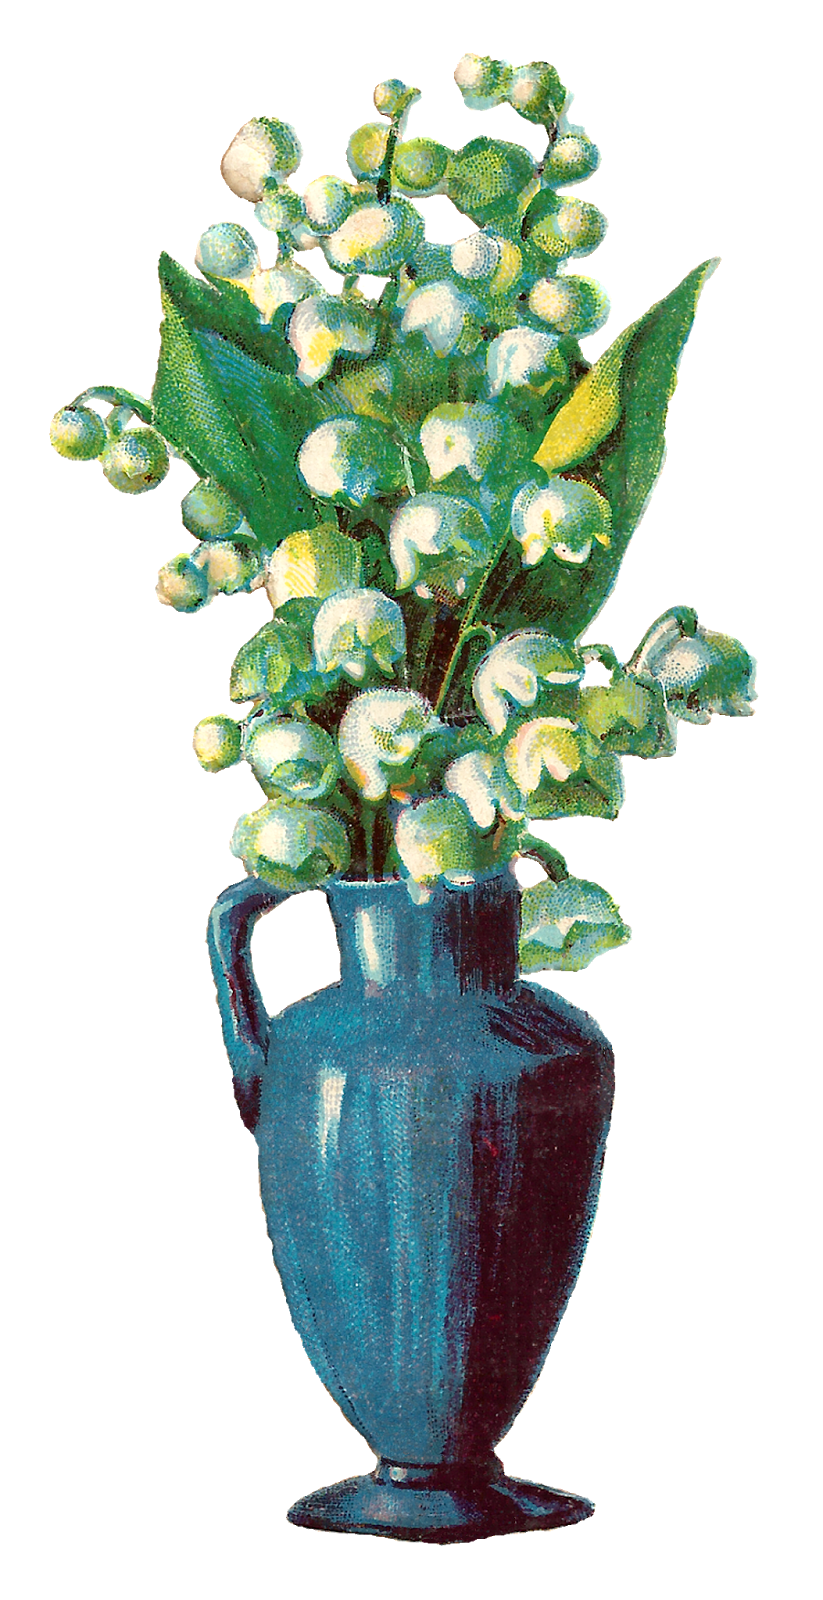 Antique images free printable. Clipart flower vase